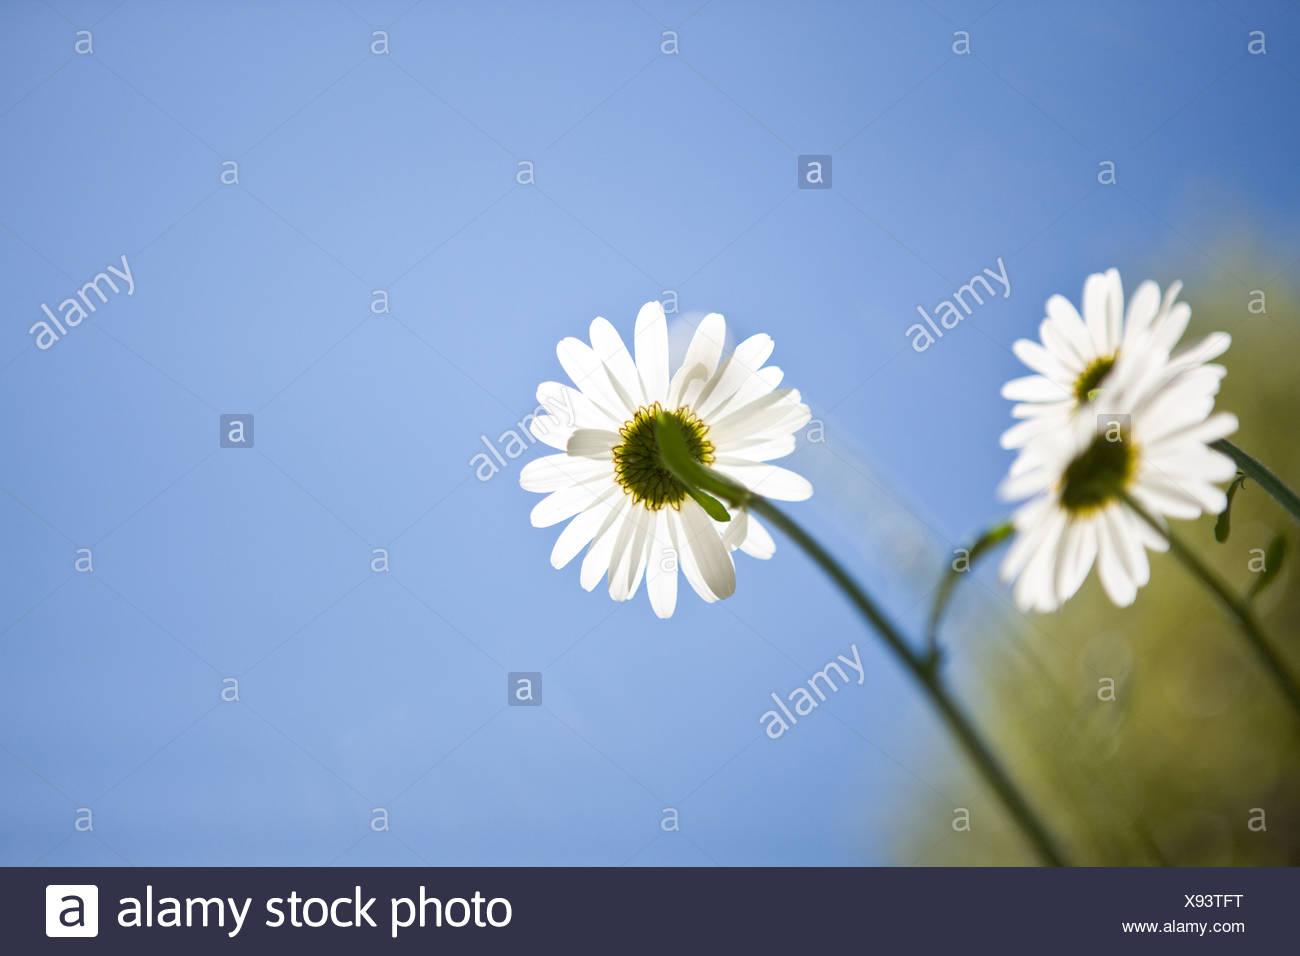 Three ox-eye daisies against a summer sky - Stock Image